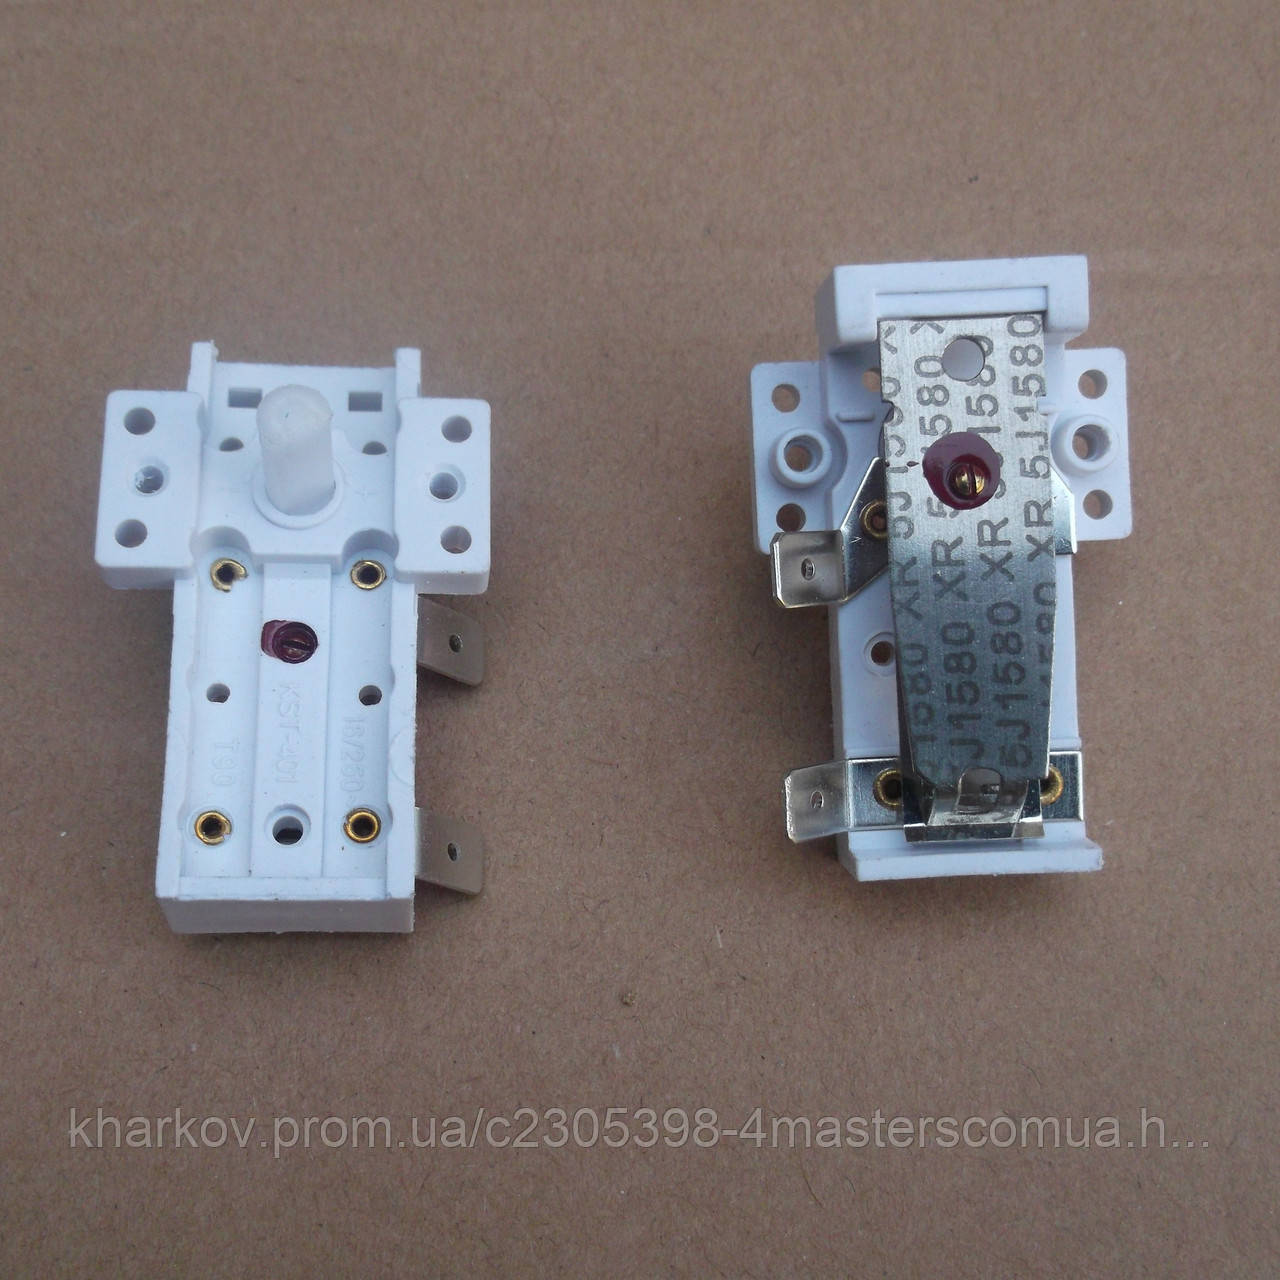 Терморегулятор для масляного радиатора 16 А до 90 *С (40, 70, 80*С)